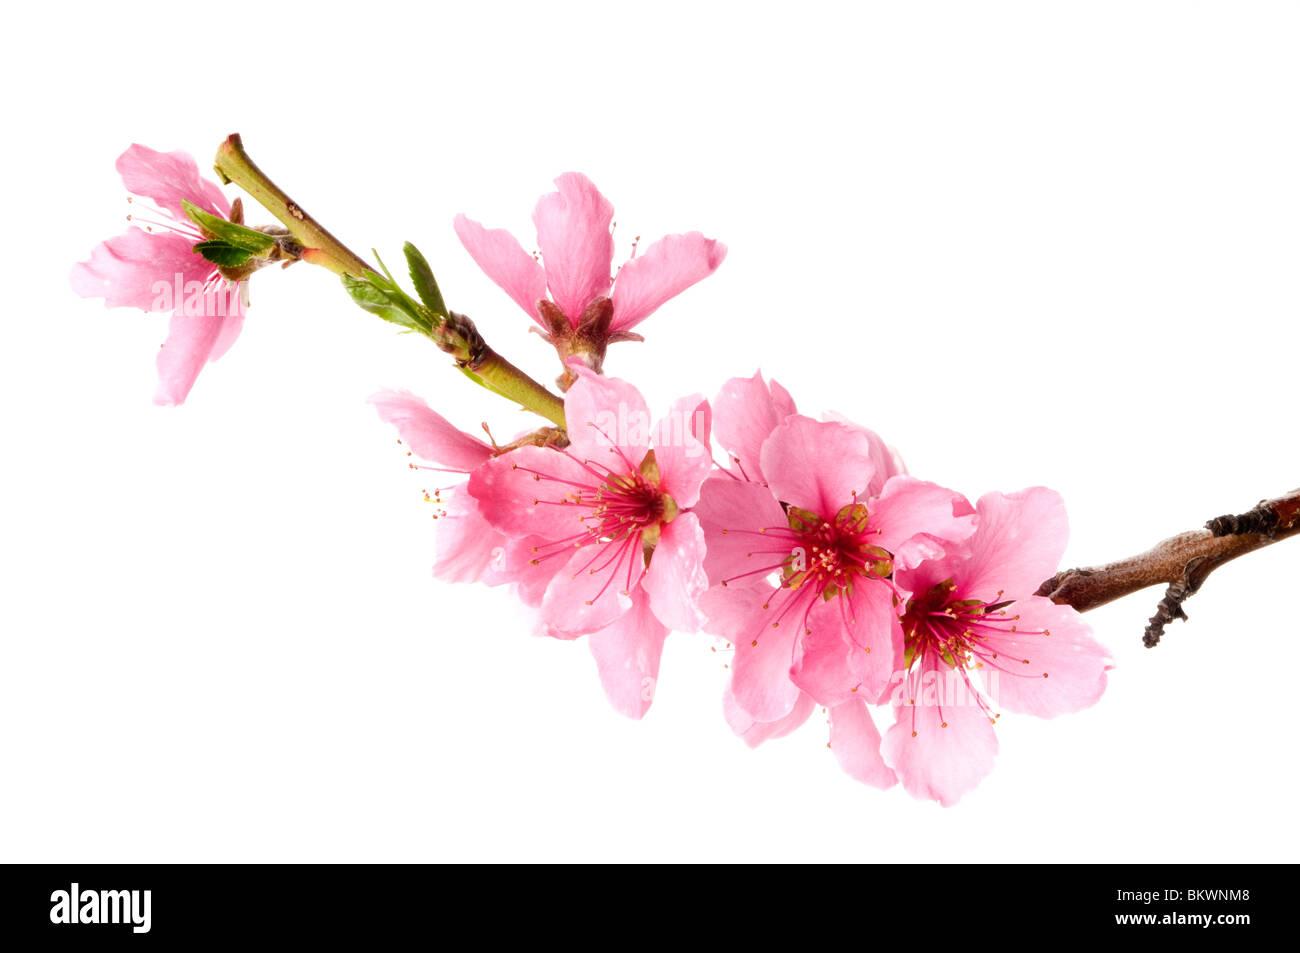 spring flowers - Stock Image